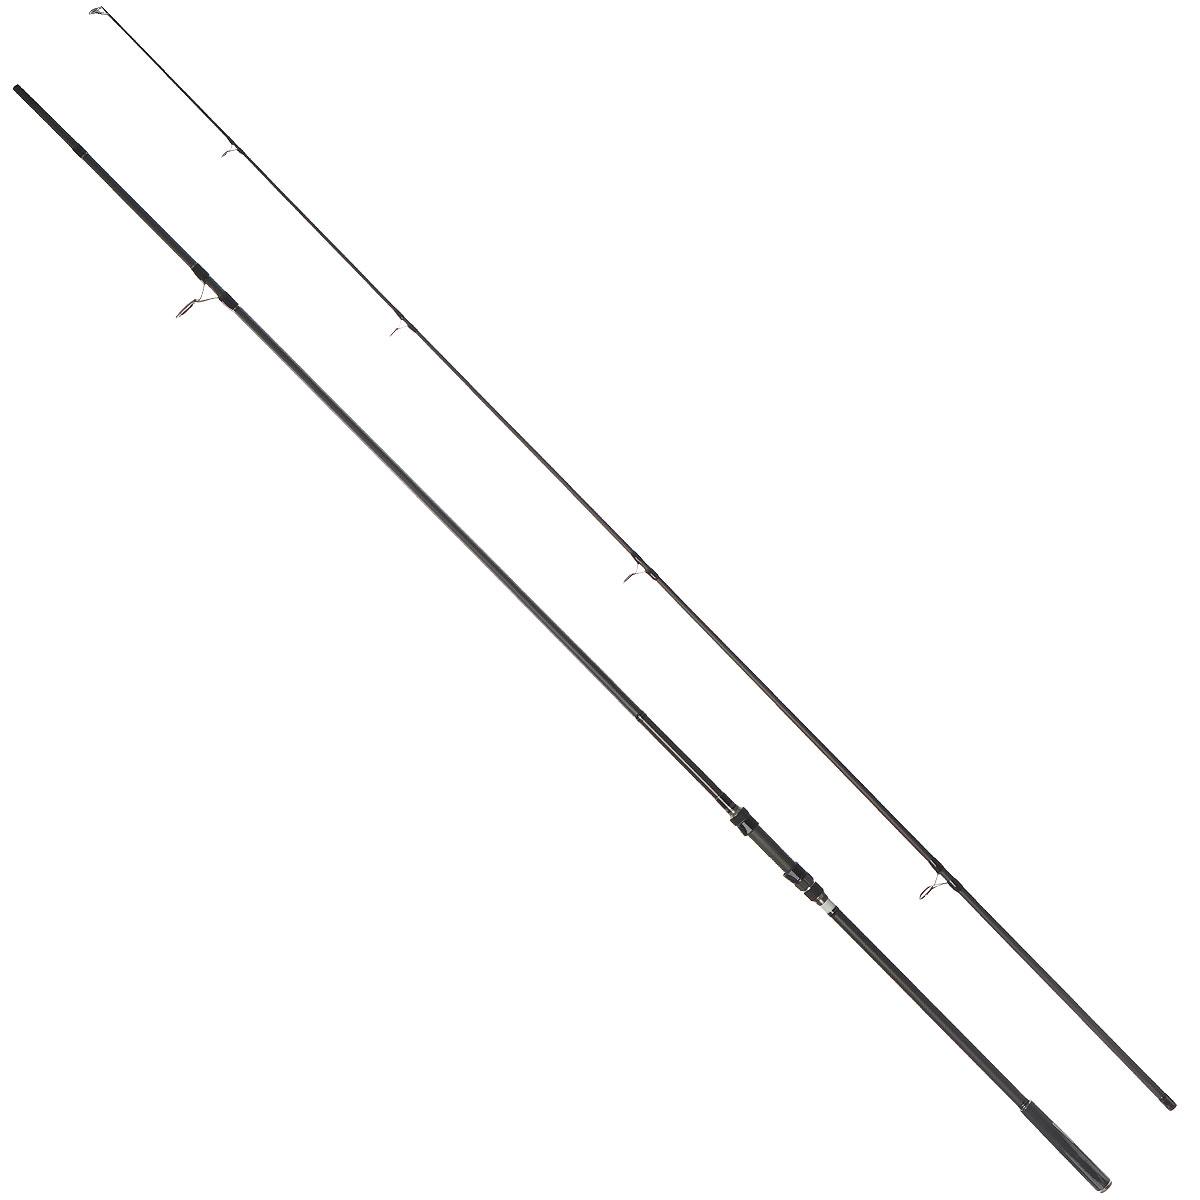 Удилище карповое Daiwa Windcast Carp, 3,9 м, 3,5 lbs удилище карповое daiwa shogun slim power shoc 3312